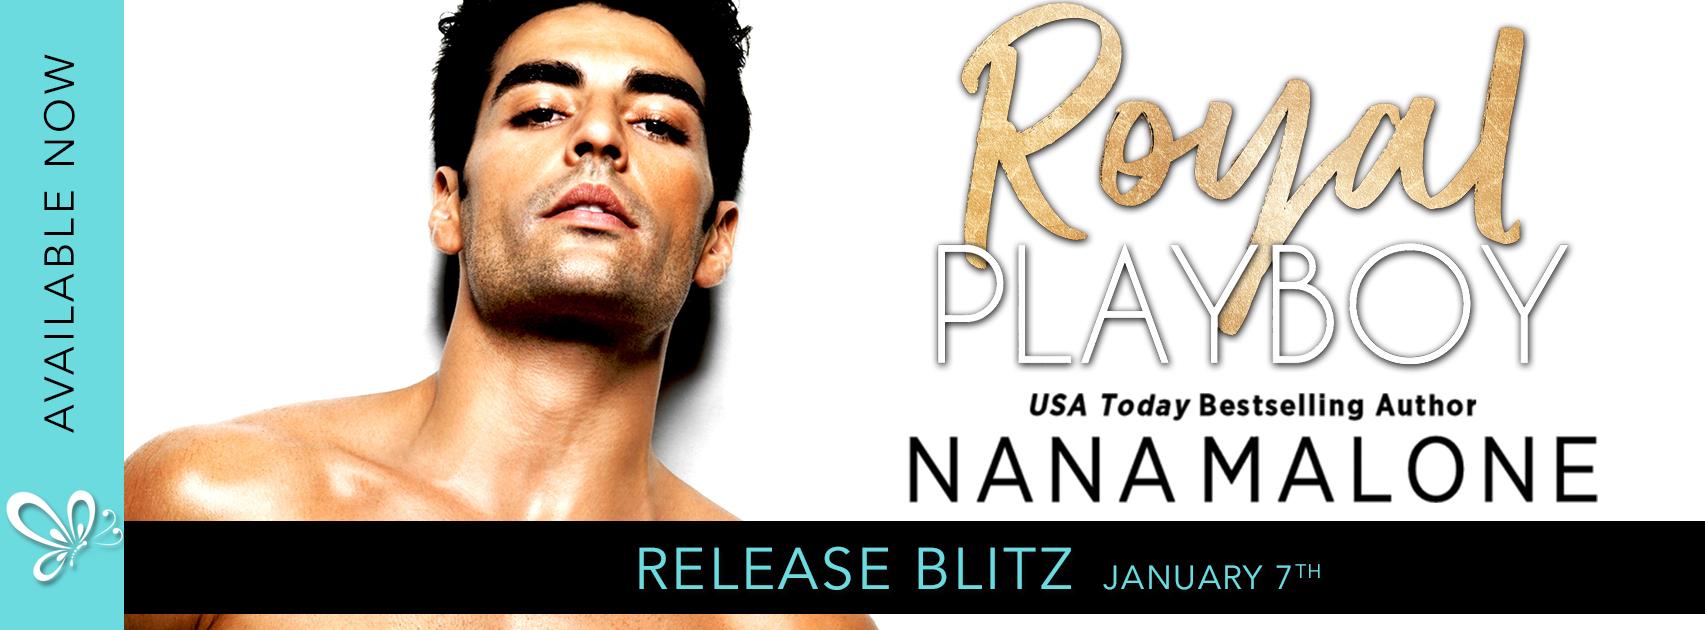 Social Butterfly PR Release Blitz: Royal Playboy by Nana Malone